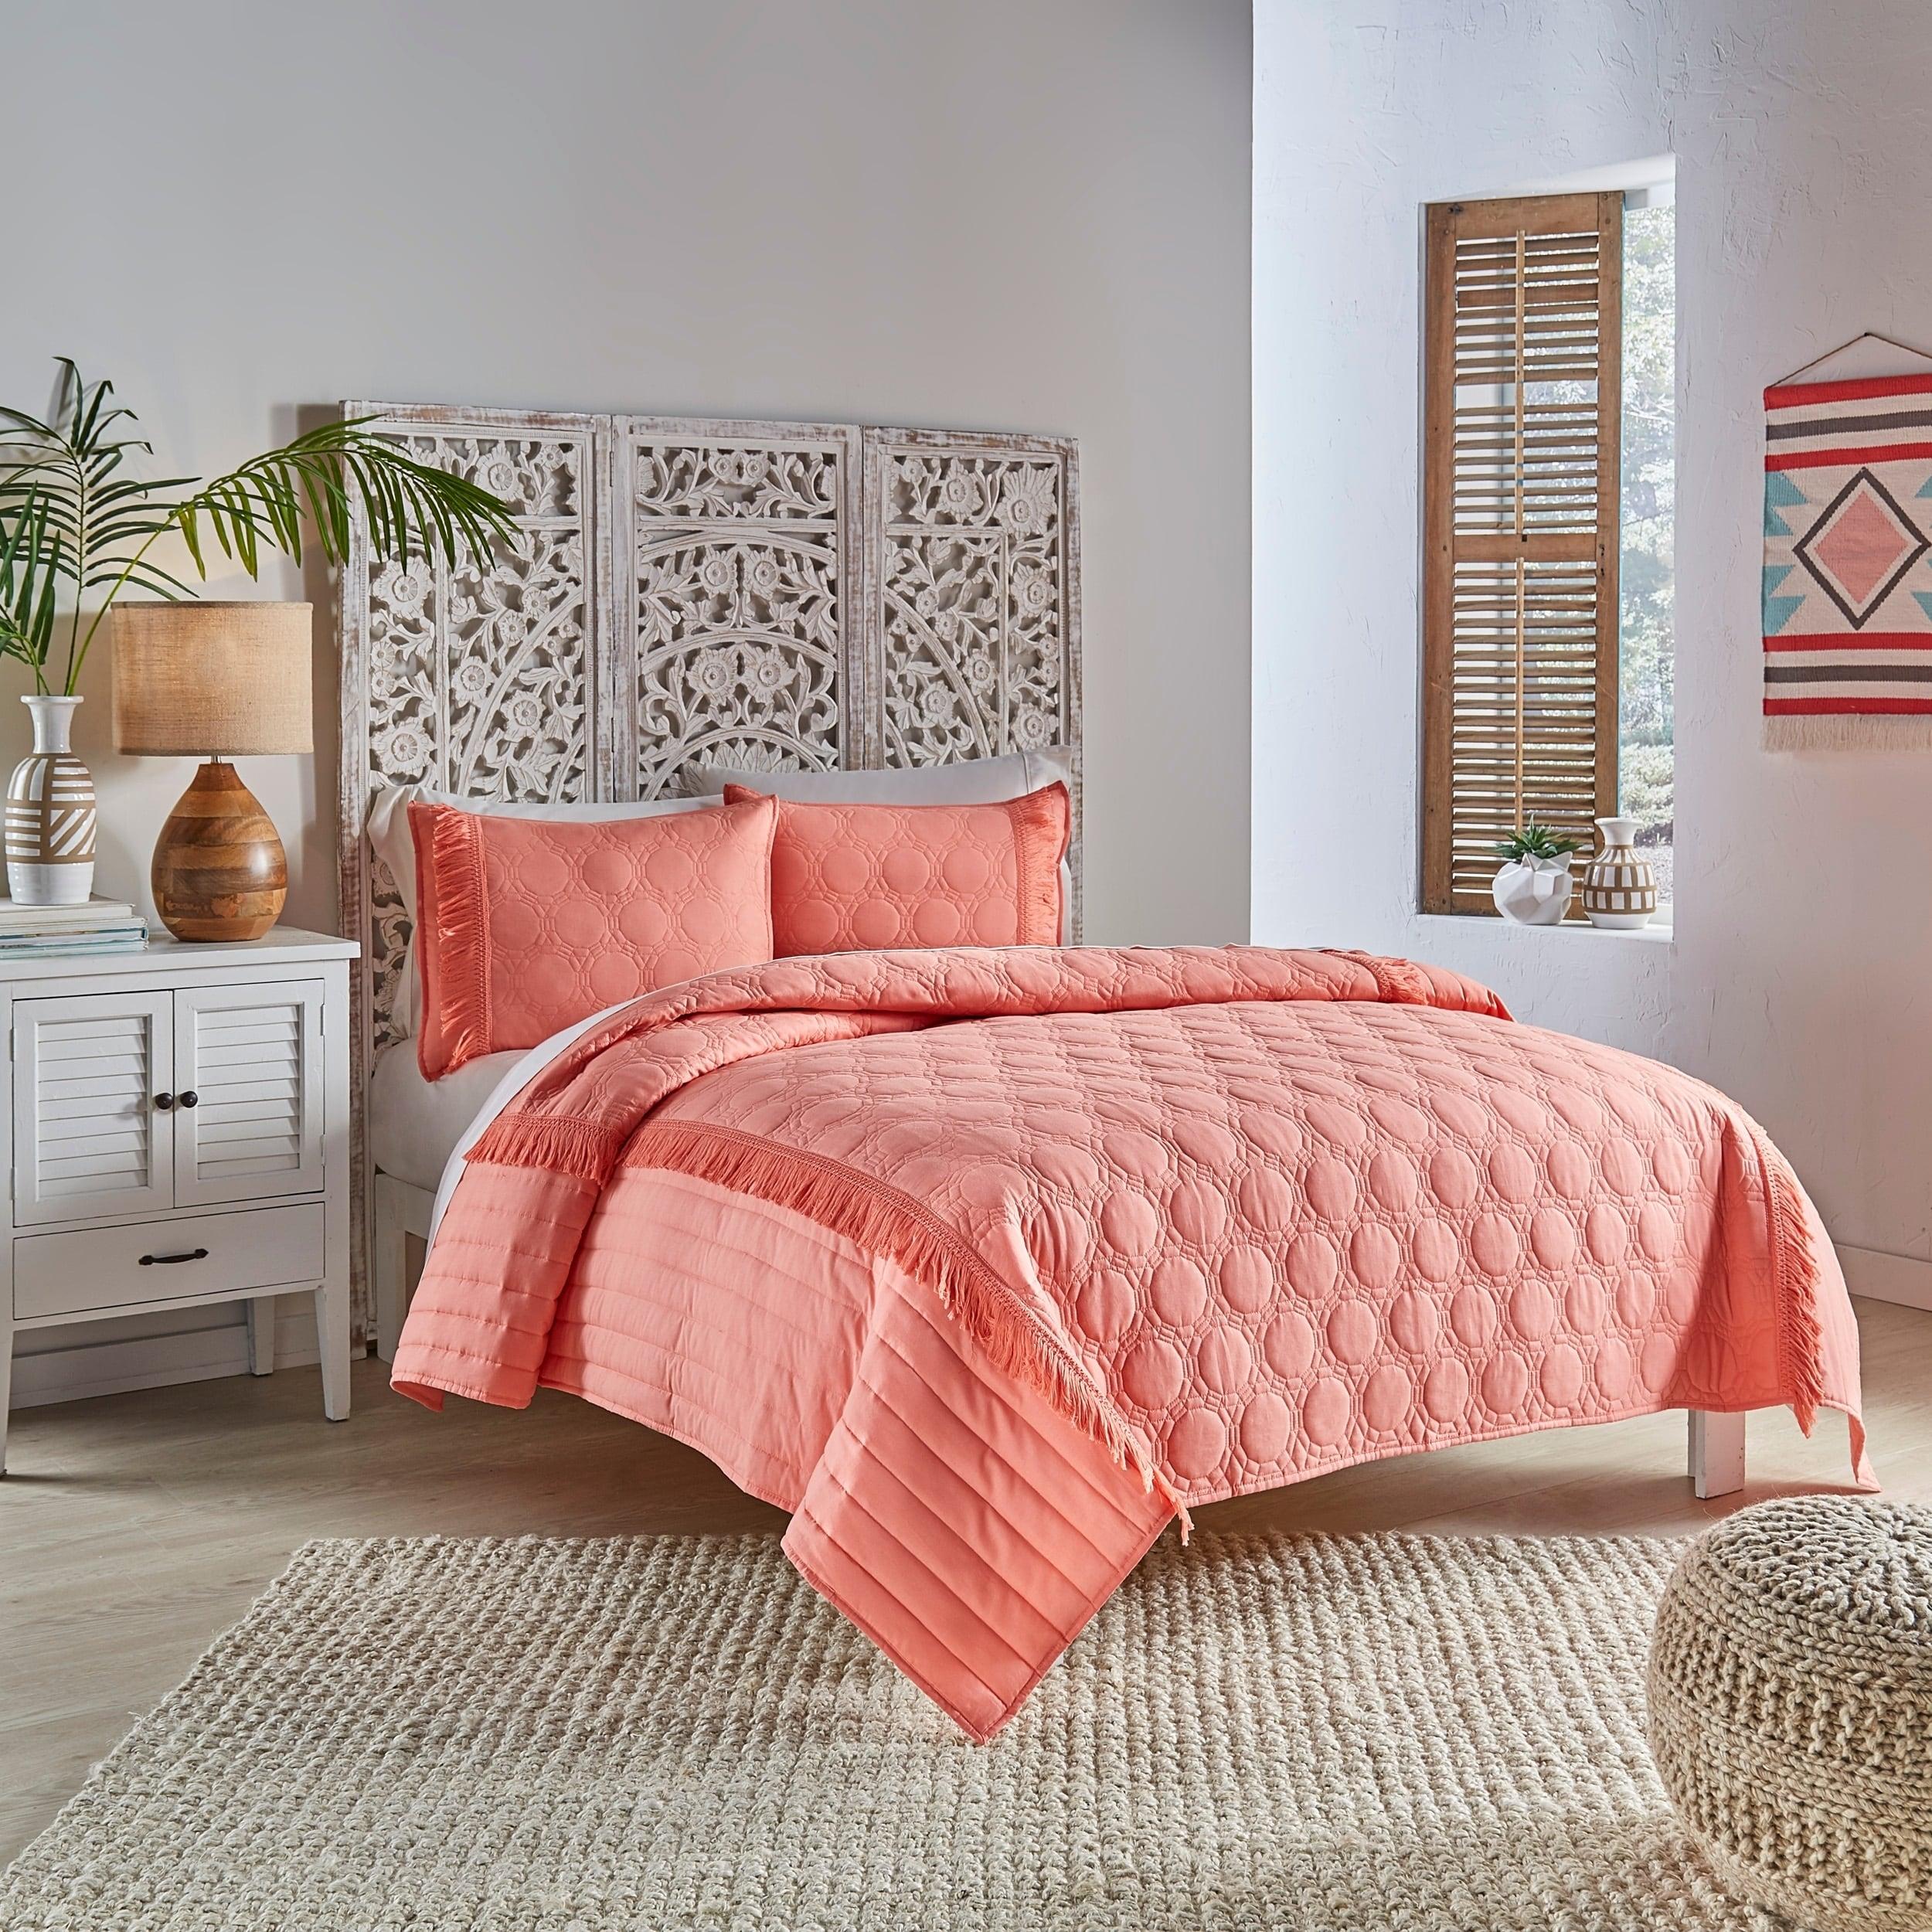 Ellery Homestyles Boho Boutique Boho Darling Quilt Set